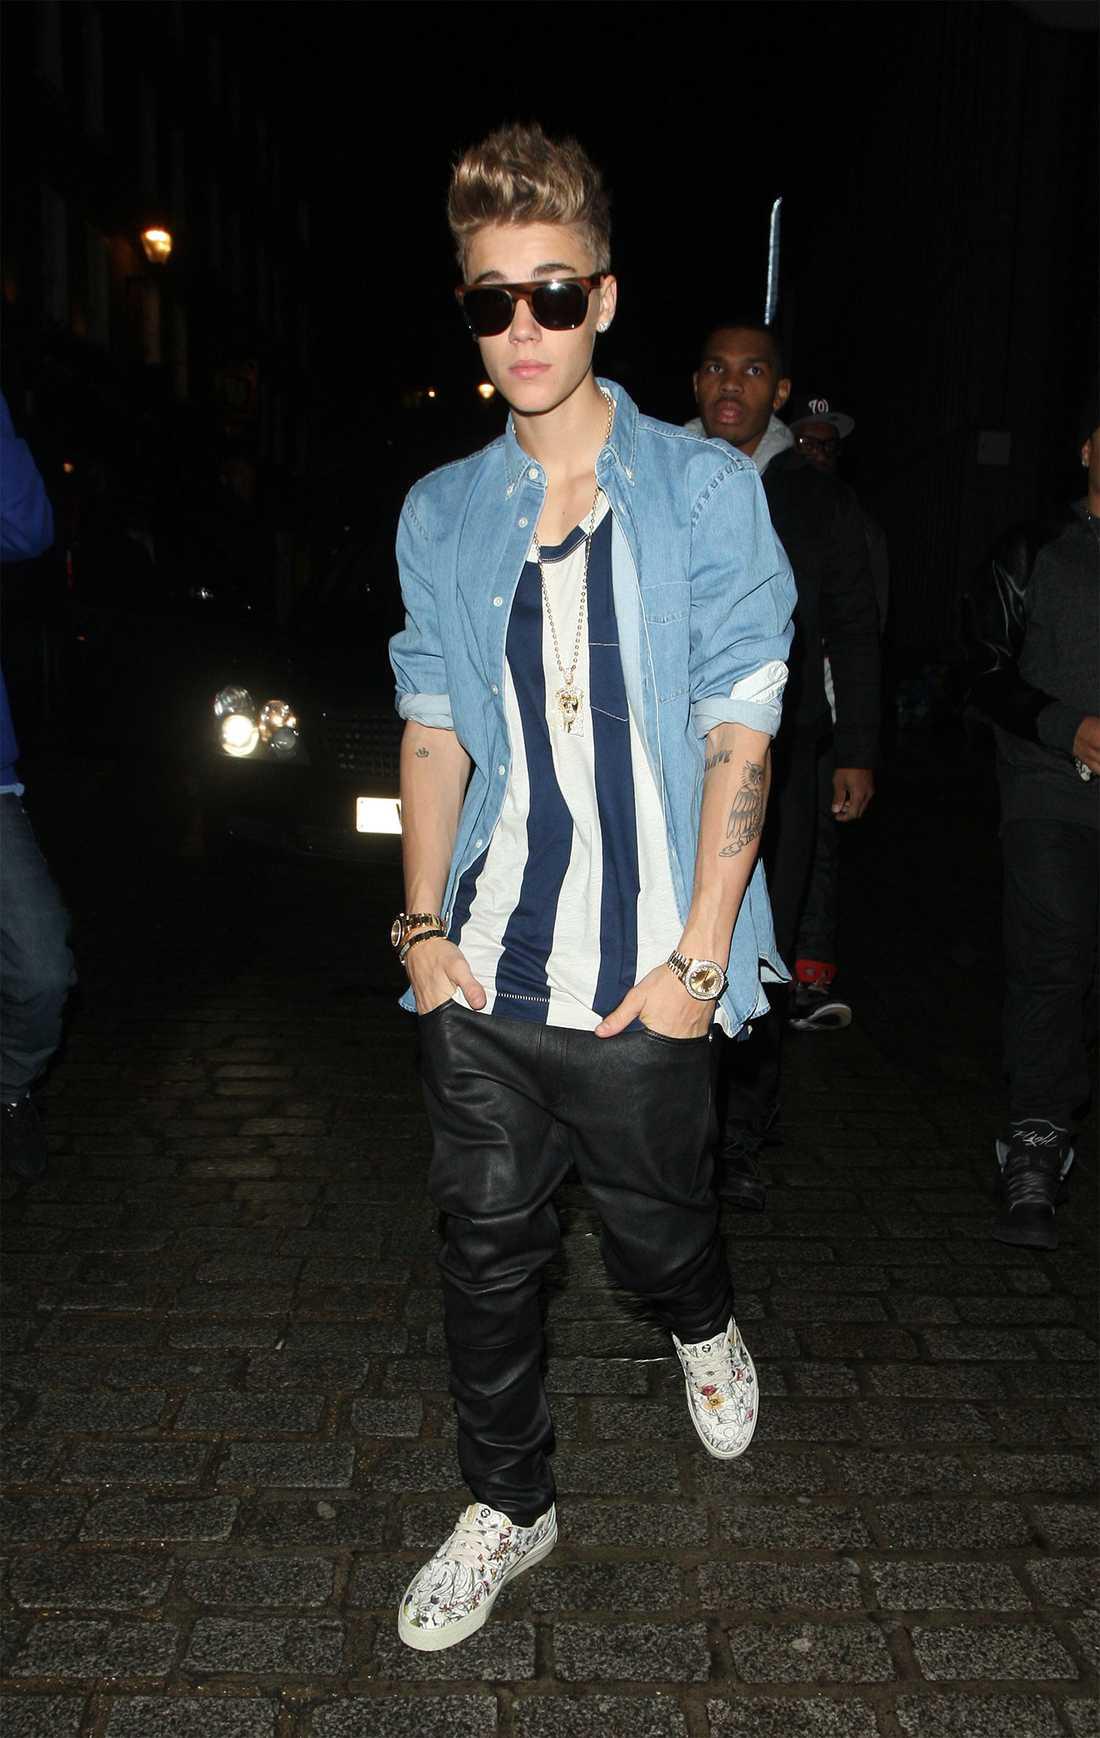 Justin Bieber tatuerade sig tidigare under turnén...